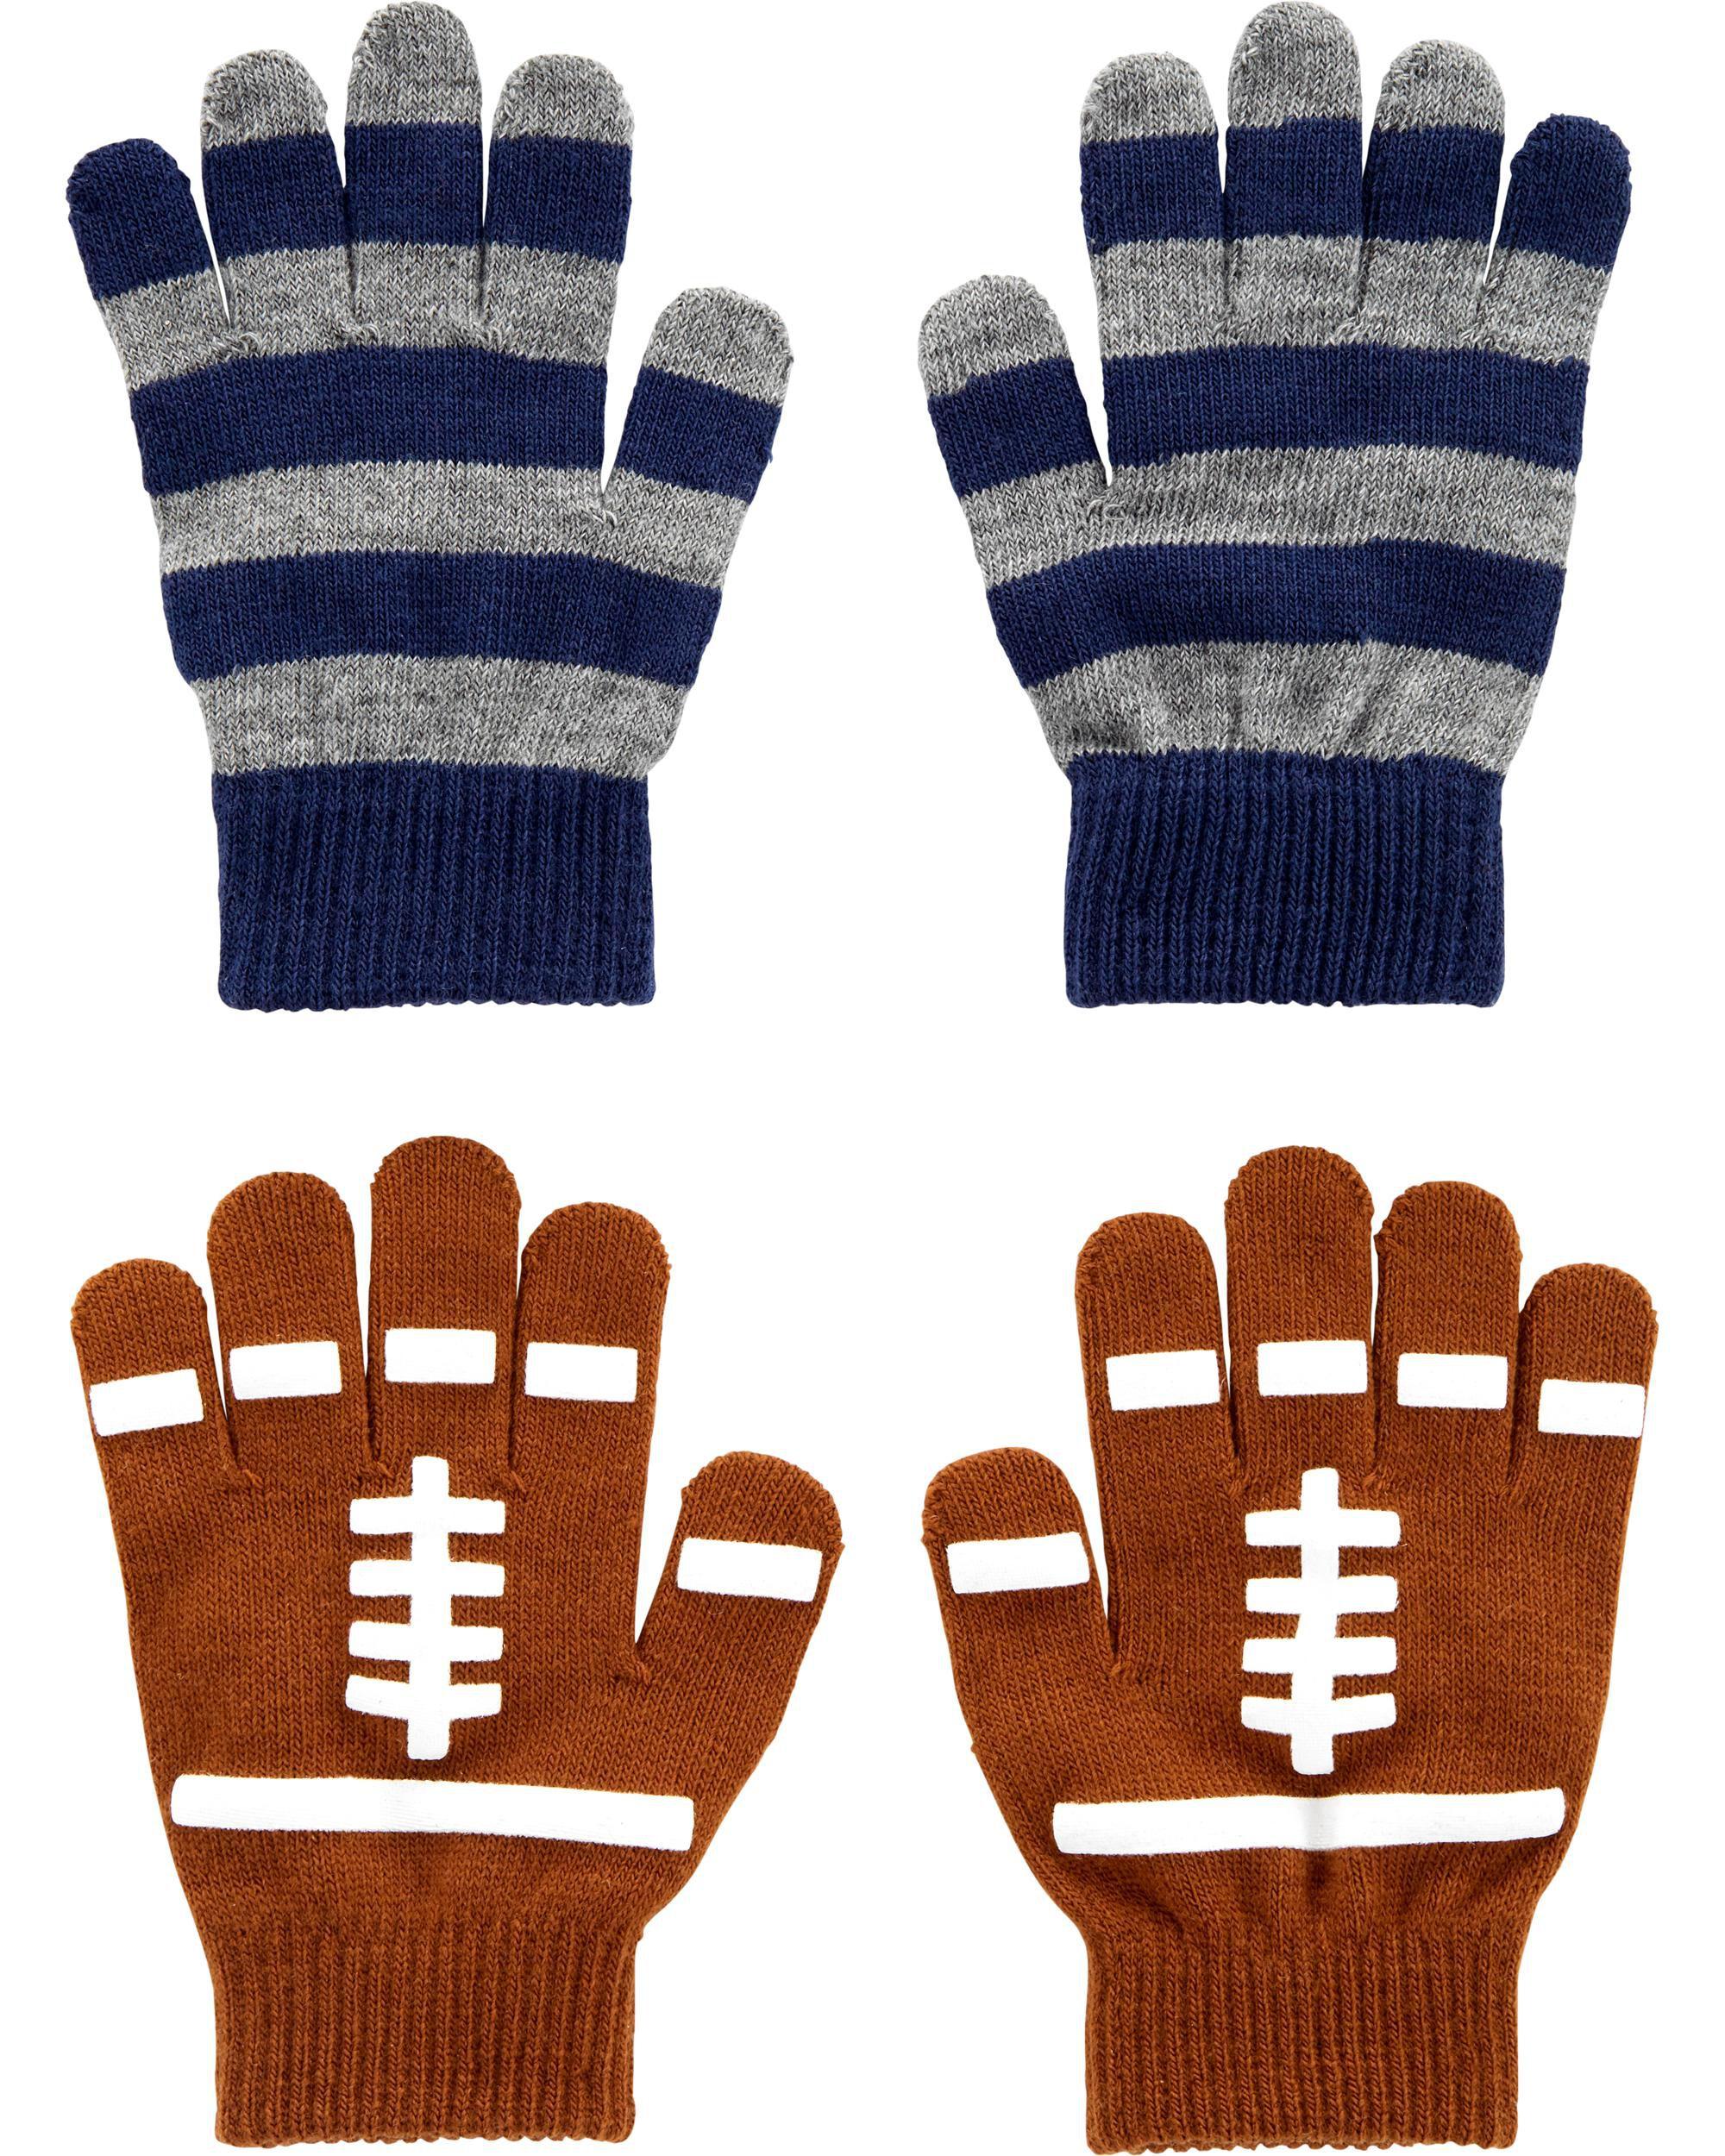 *DOORBUSTER*2-Pack Football Gripper Gloves